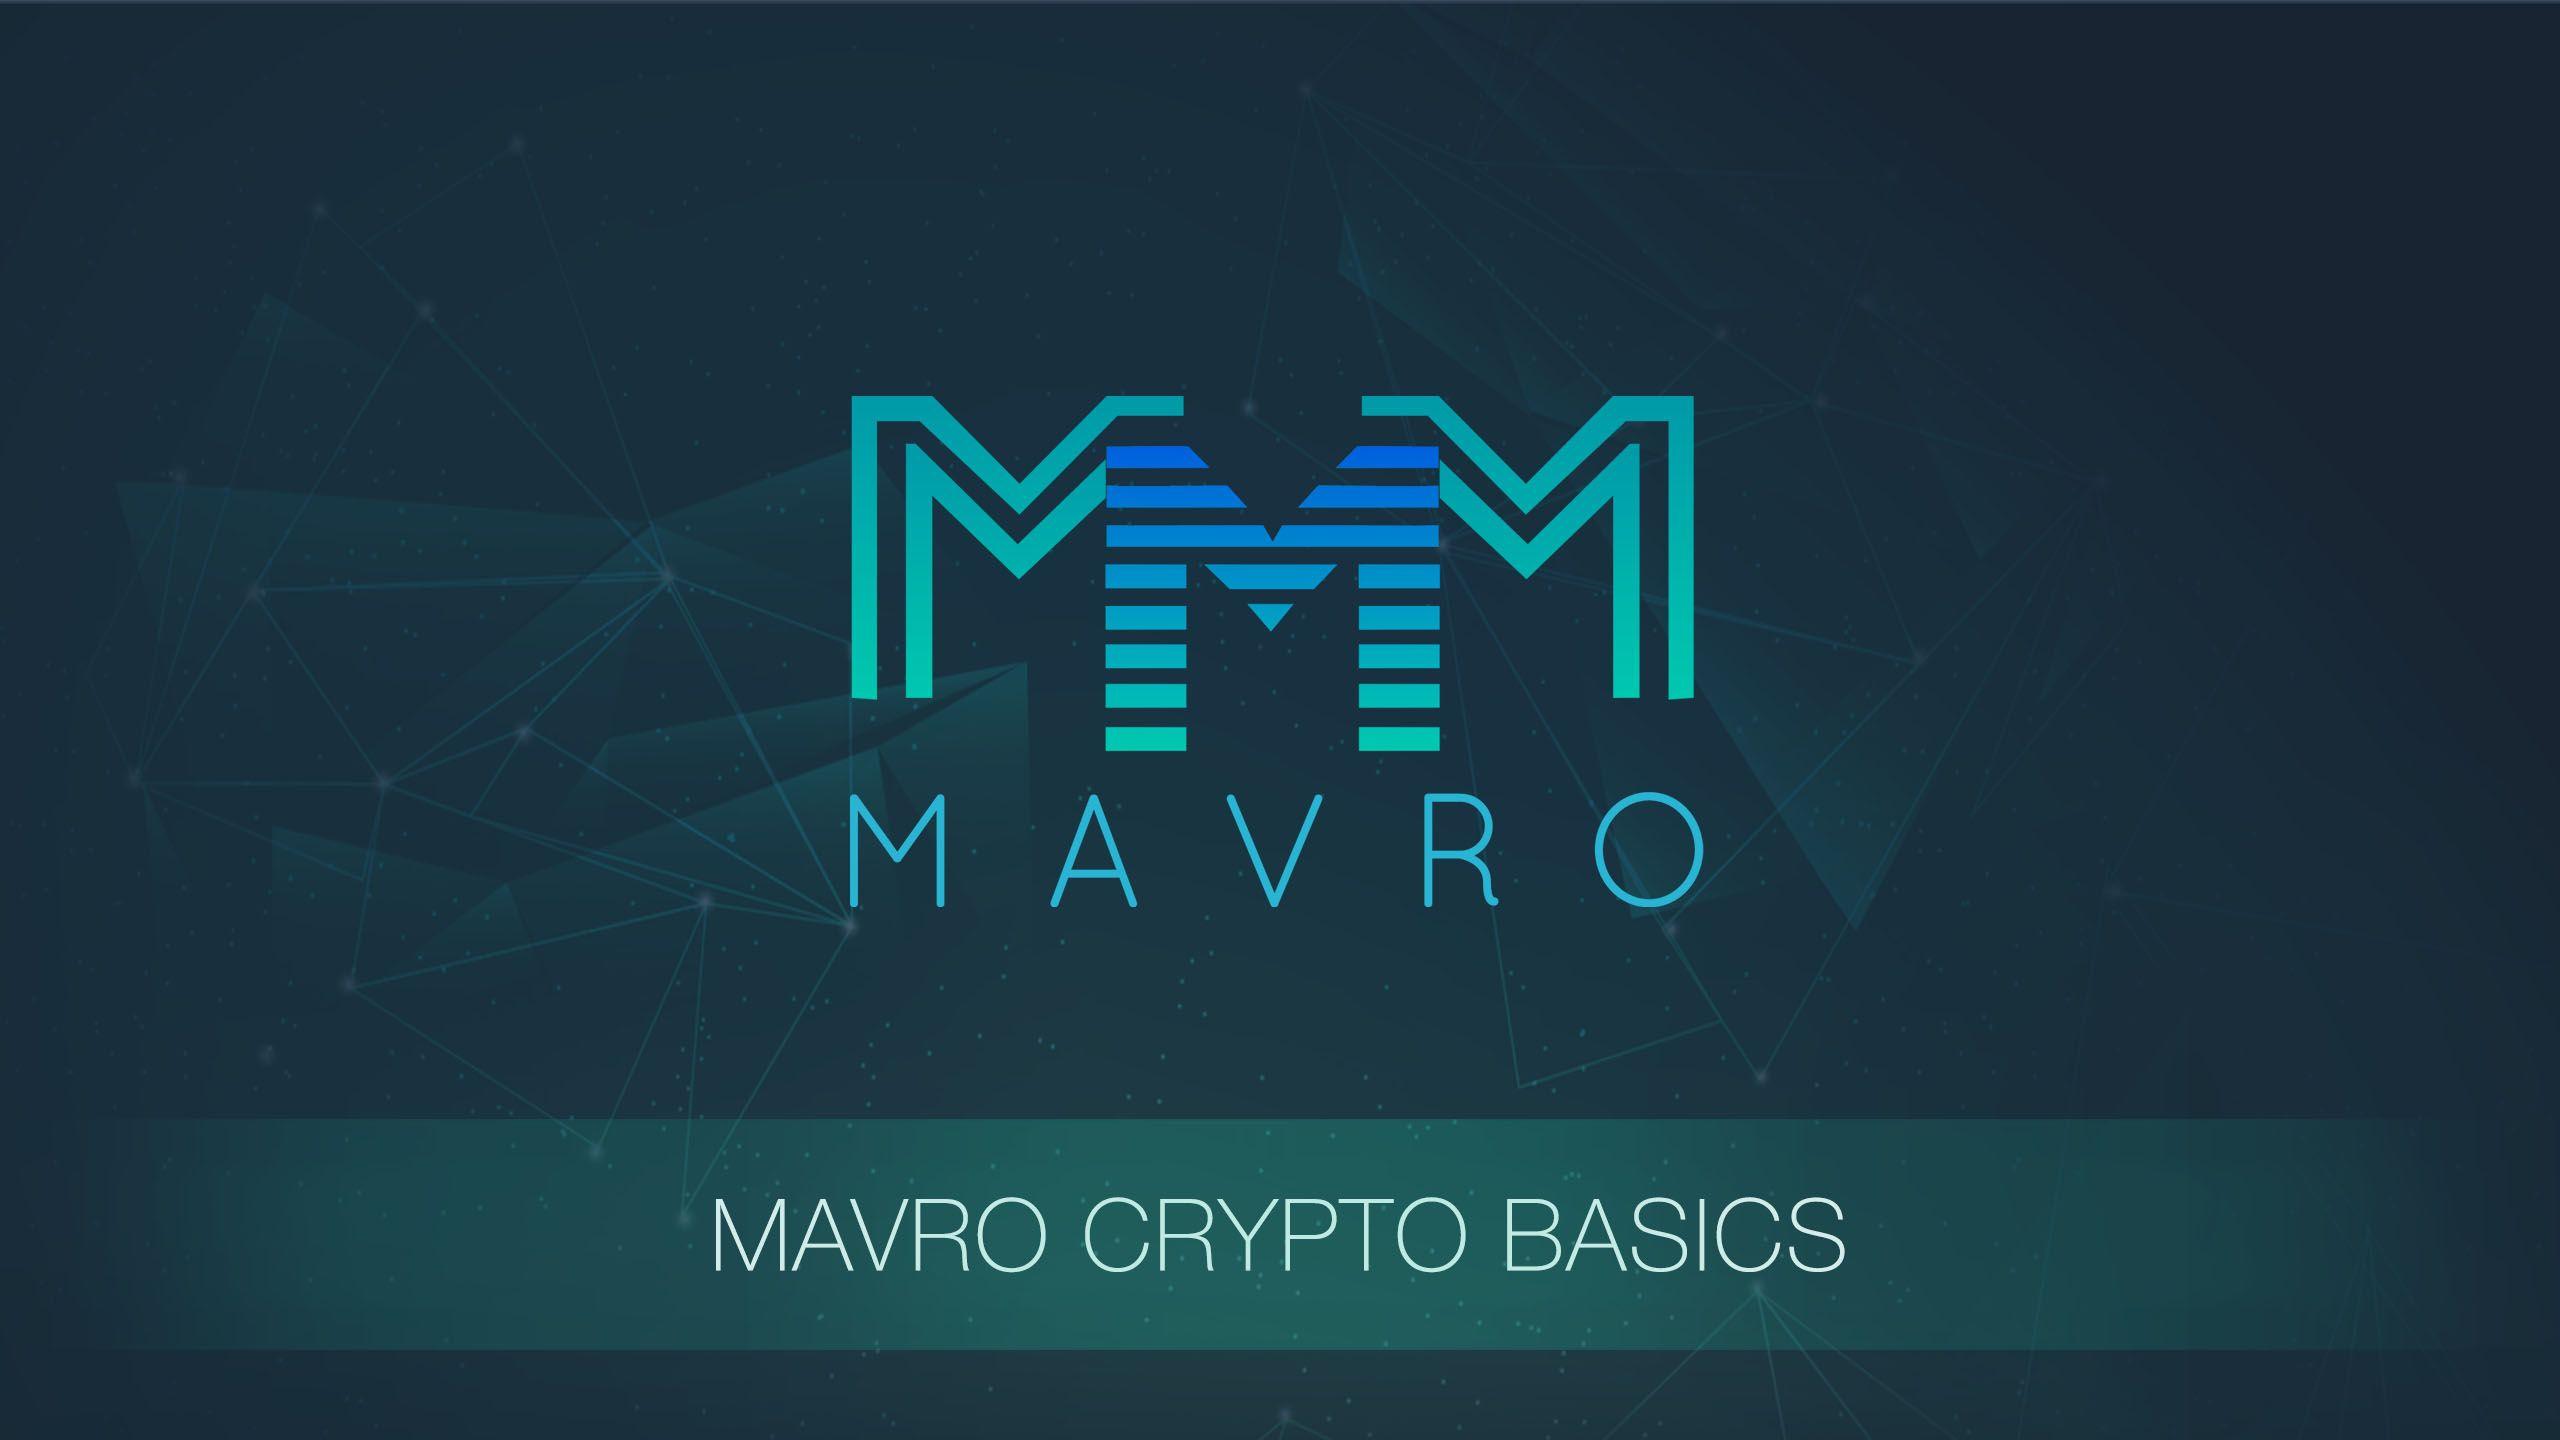 MAVRO CRYPTO BASICS.jpg